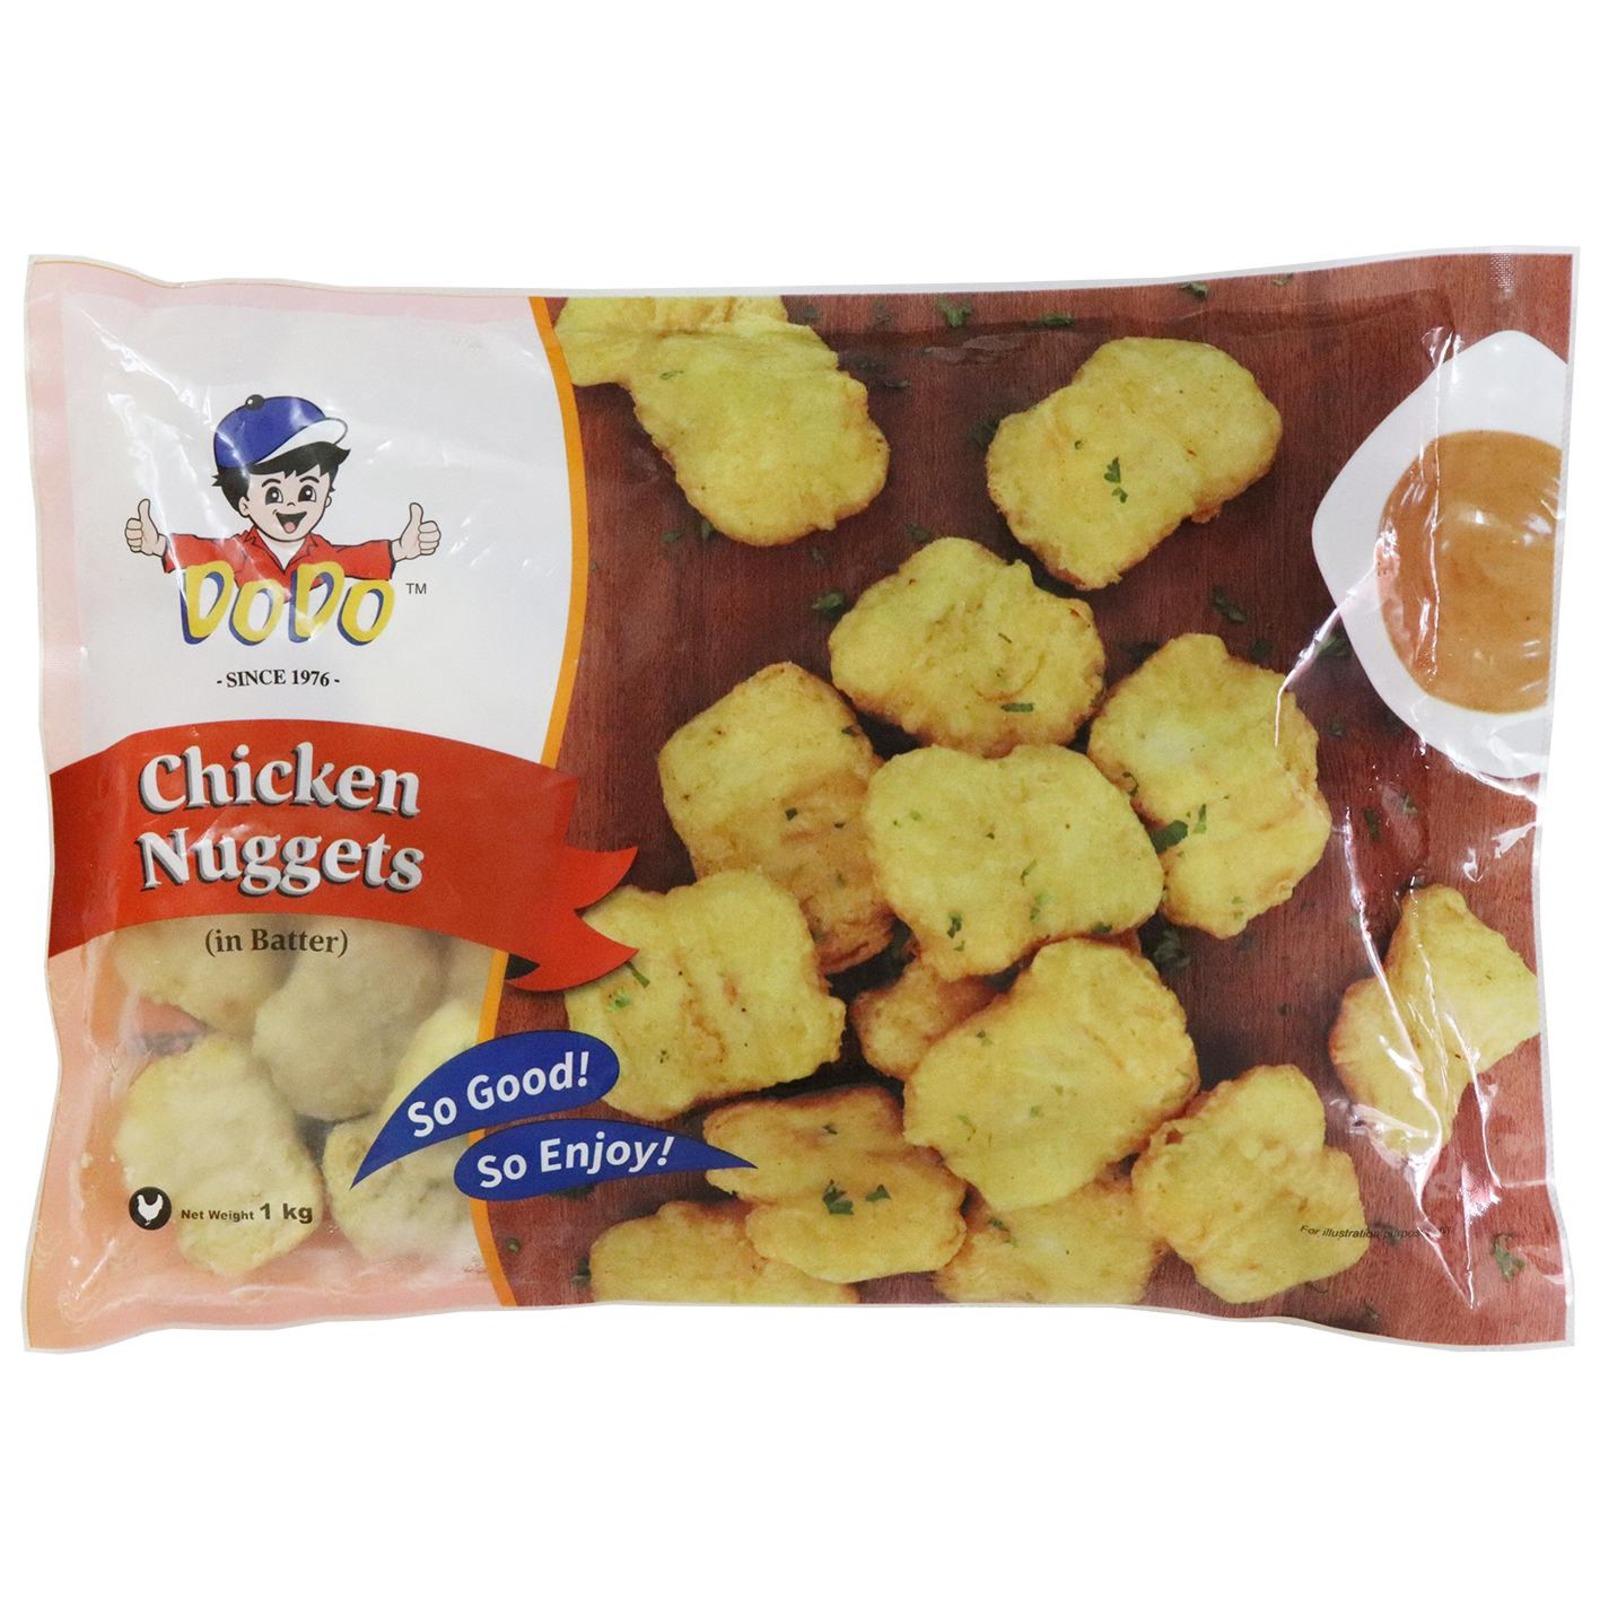 DODO Chicken Nugget (In Batter)